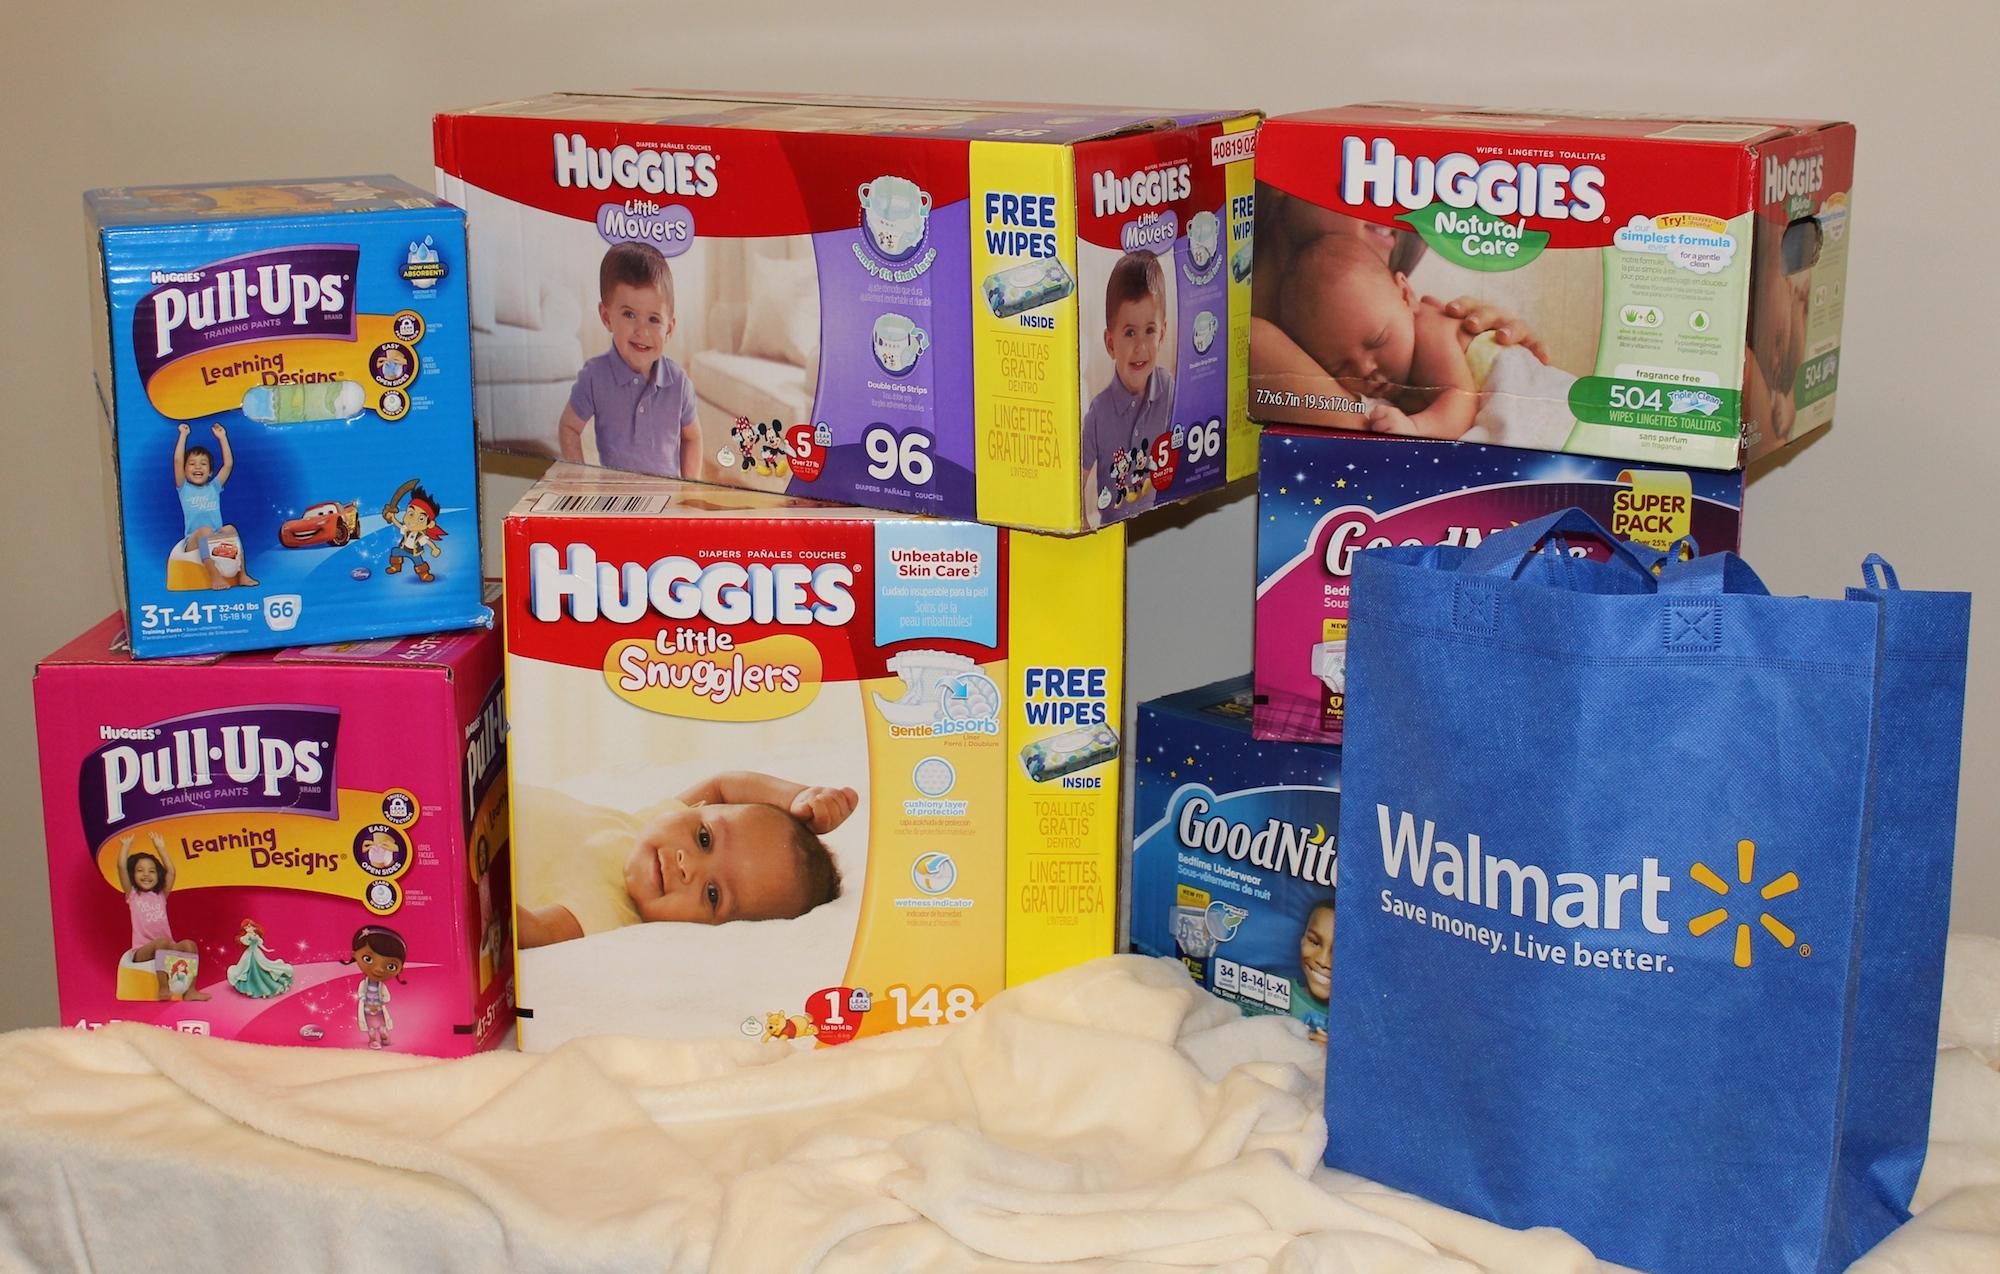 Free Digital Printable Diaper Coupons At Walmart - Free Printable Coupons For Pampers Pull Ups